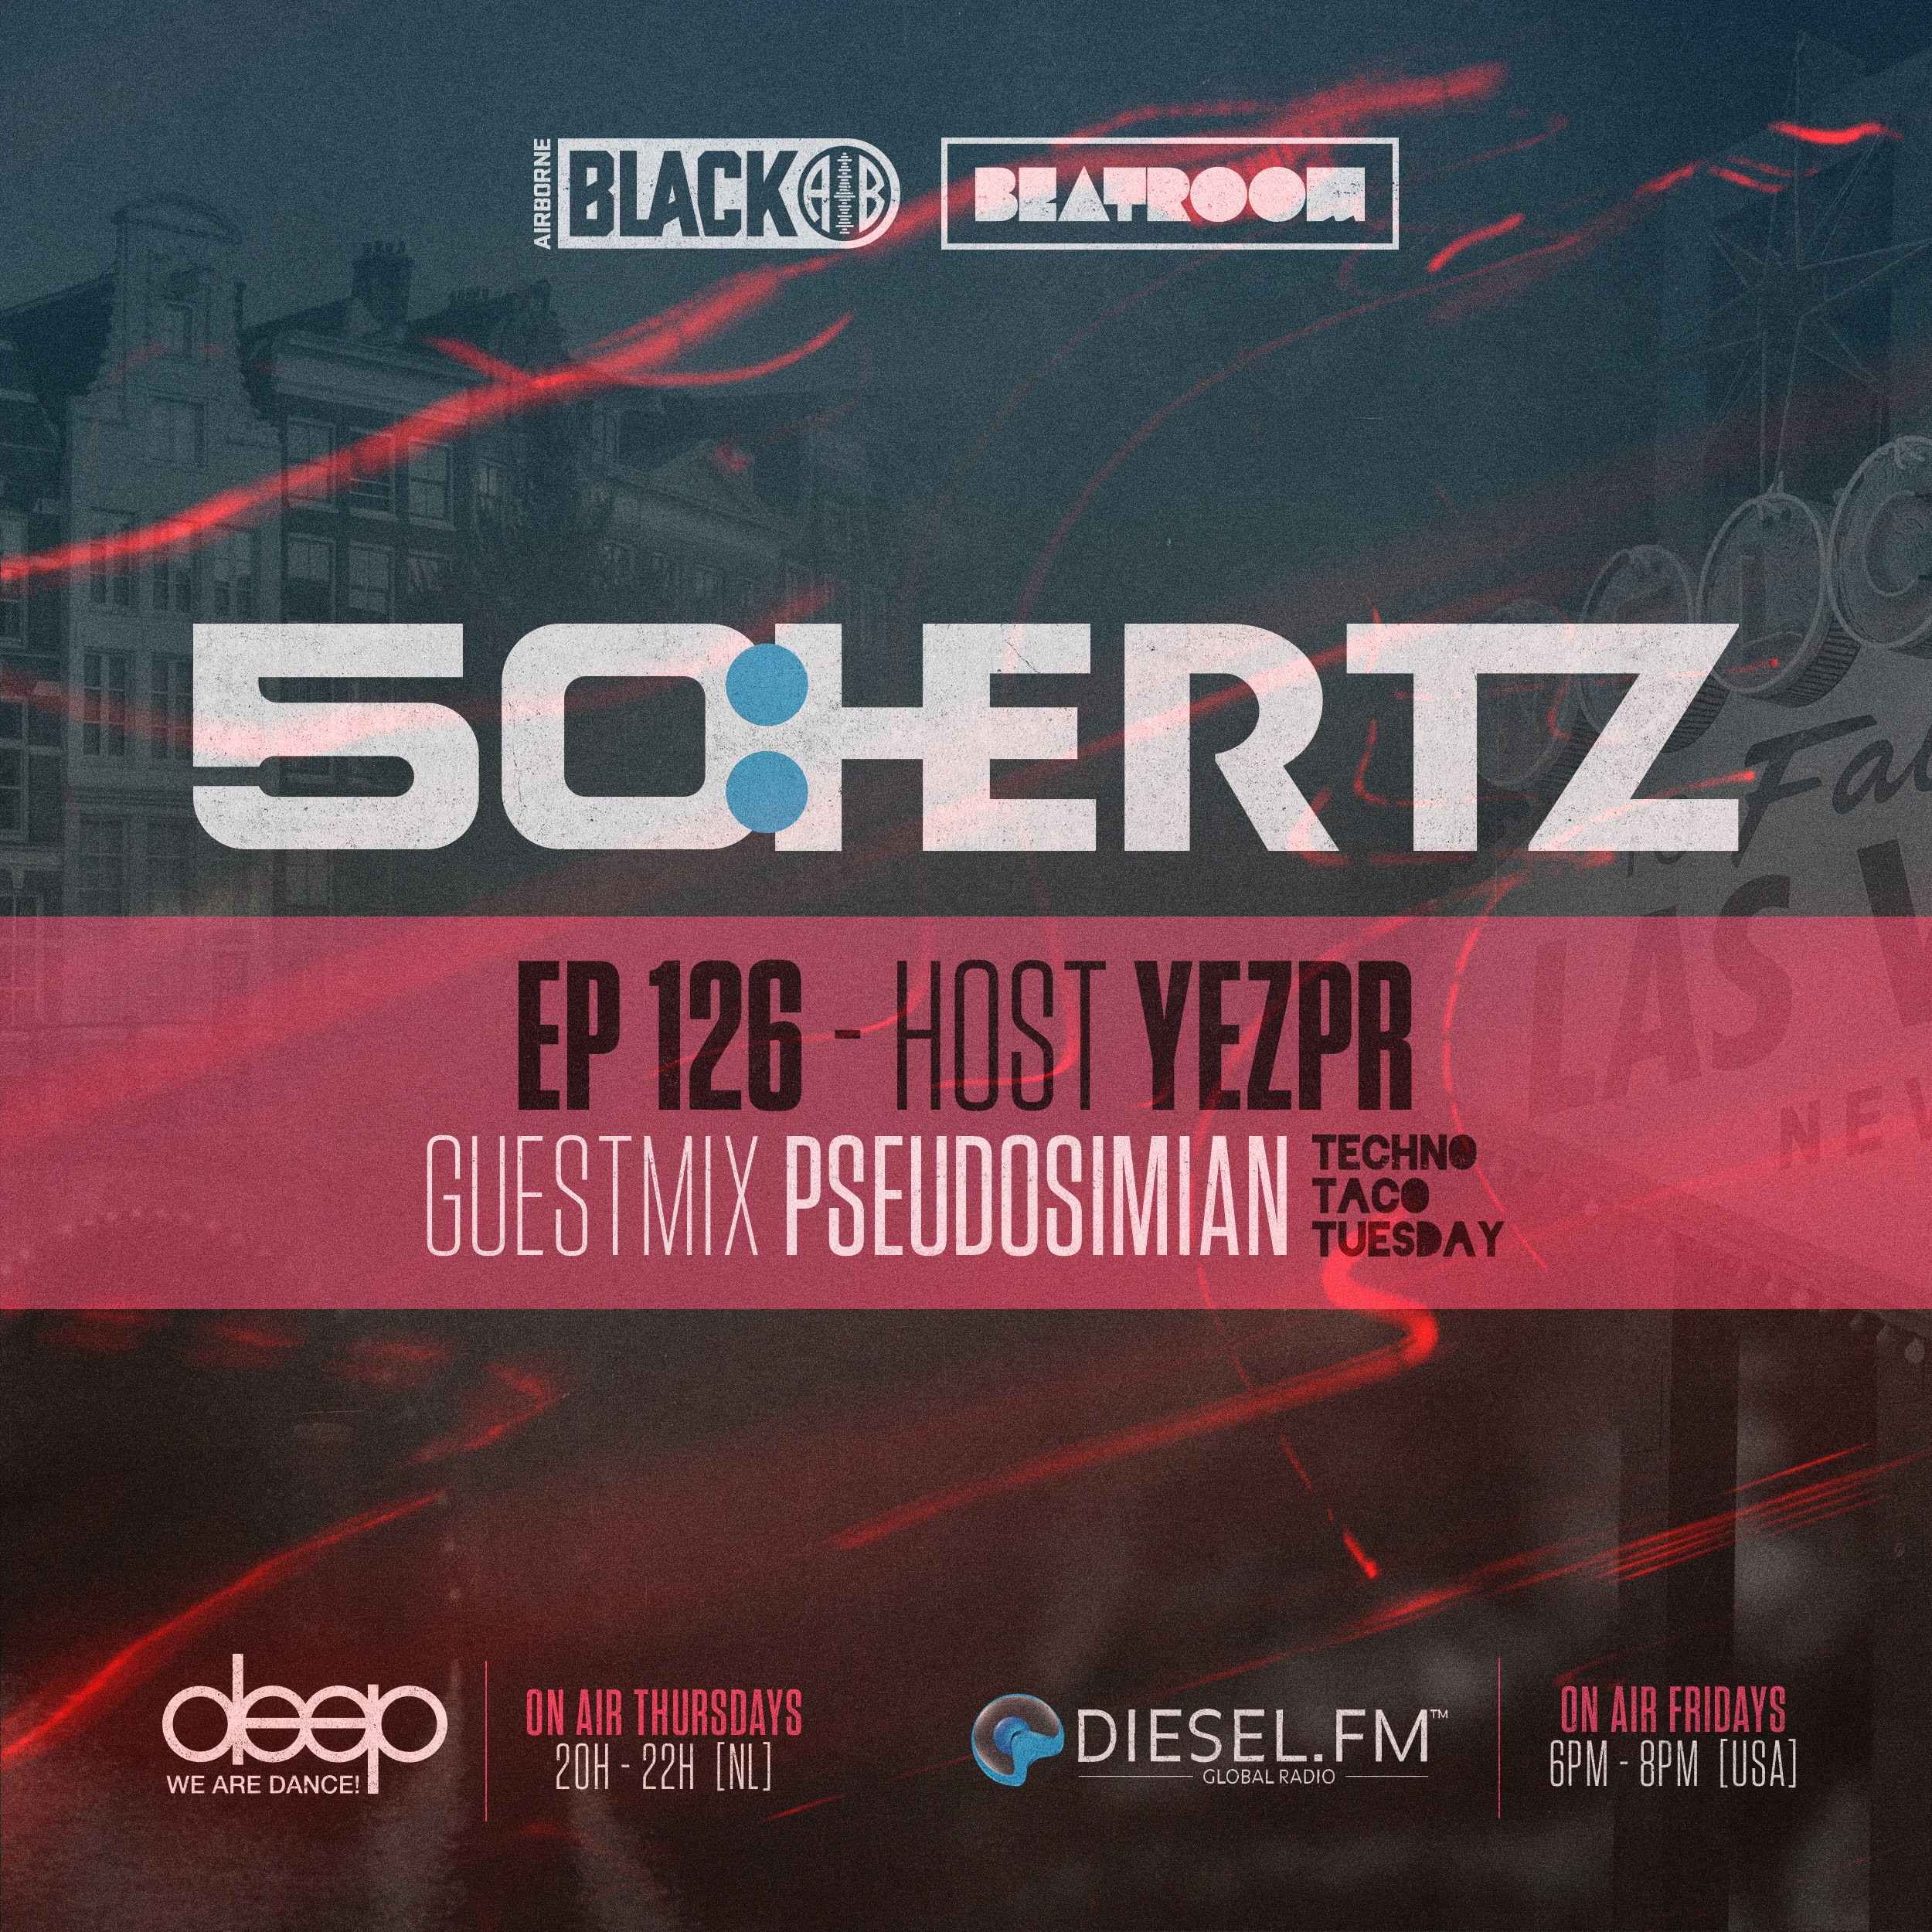 f39bc87c1f6 50:HERTZ #126 Host: YEZPR / Guest: PSEUDOSIMIAN (Diesel FM & Deep Radio)